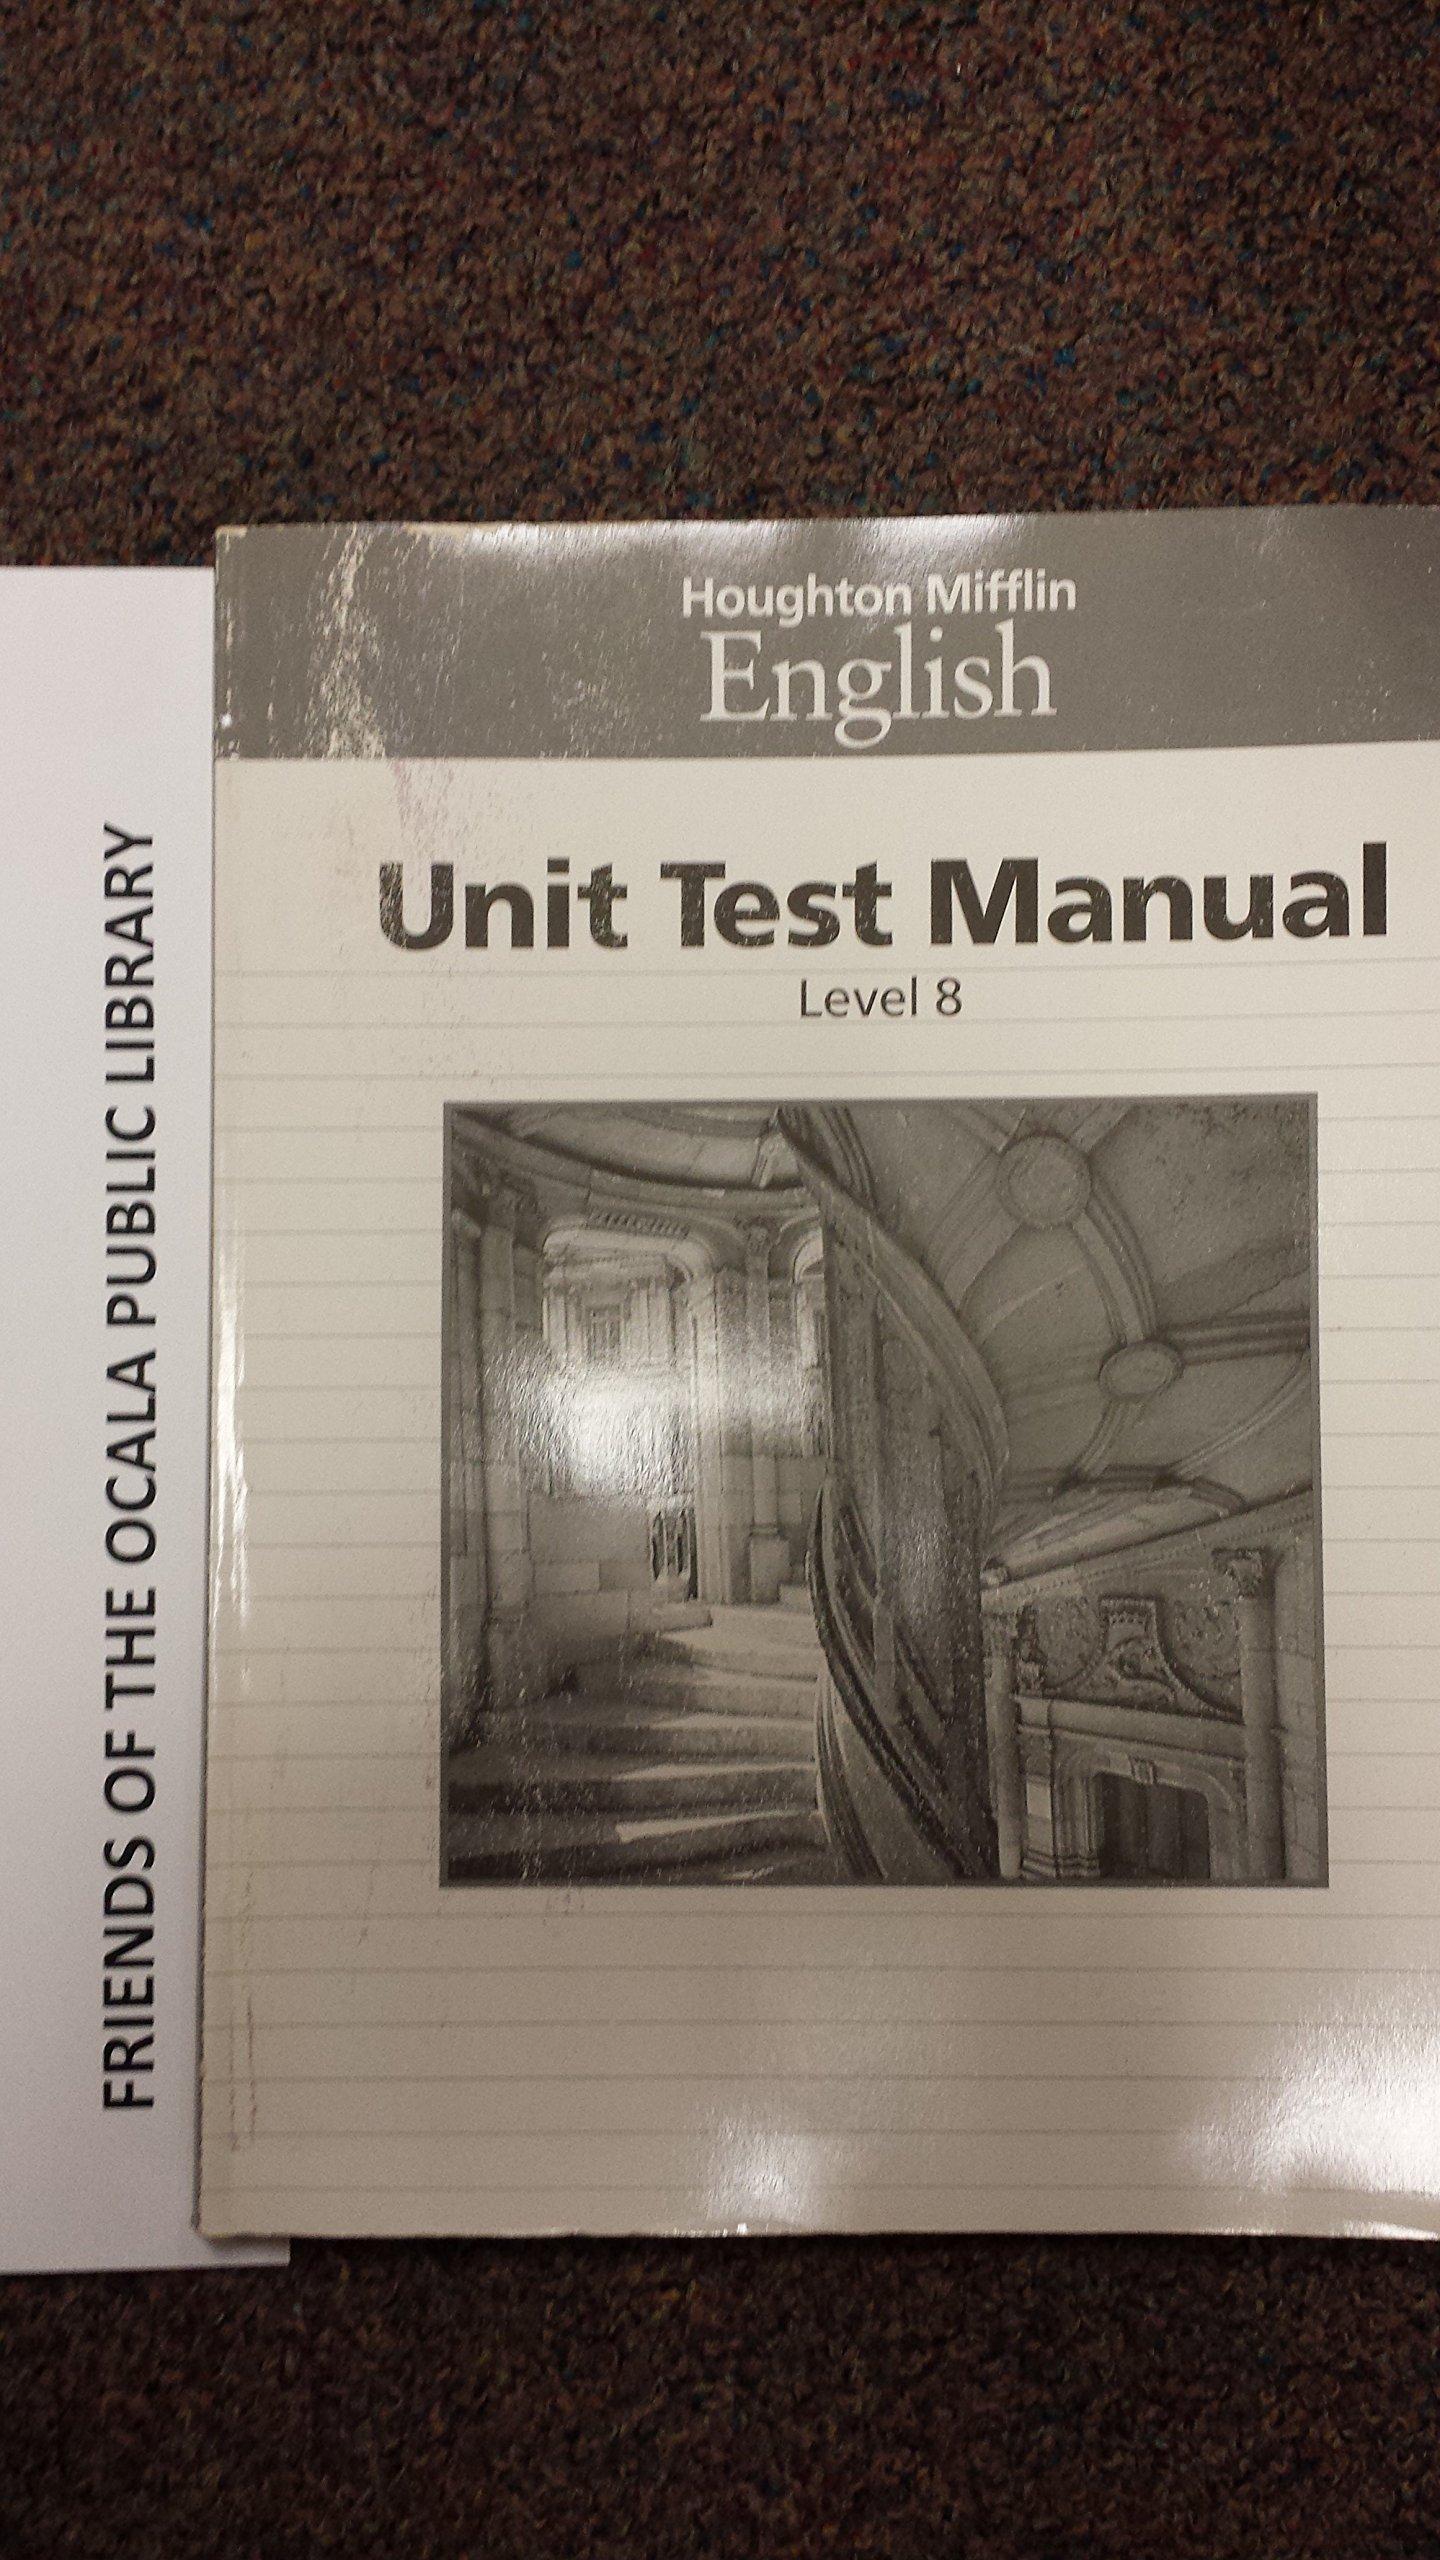 Unit Test Manual Level 8 (Houghton Mifflin English): Shirley Haley-James:  9780395422496: Amazon.com: Books